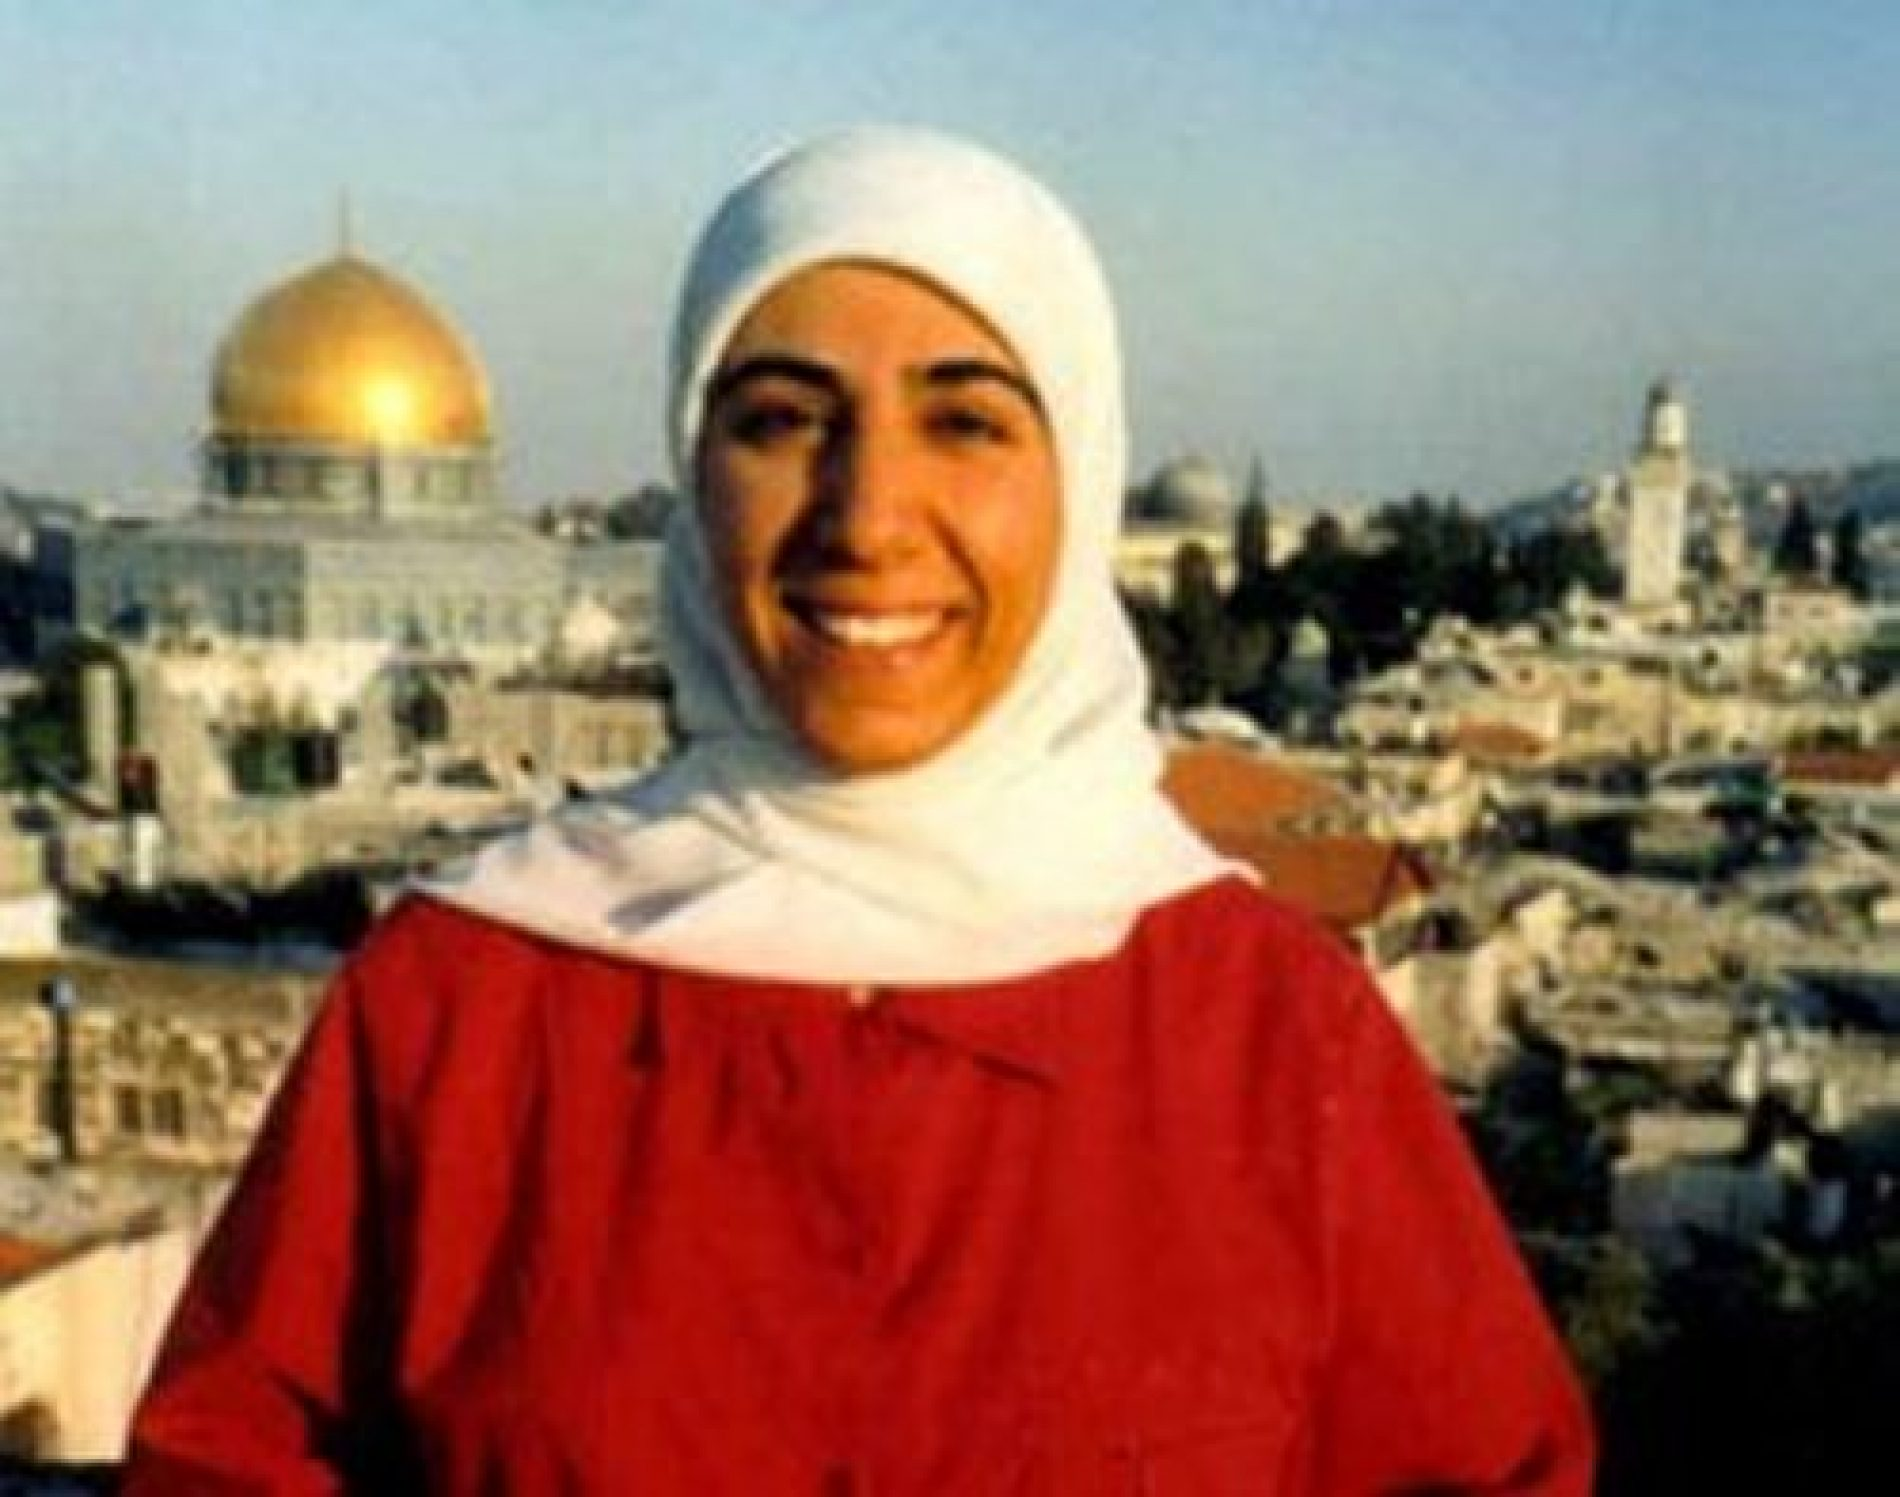 La psychiatre Dr. Samah Jaber à Palestine en Campagne 2015